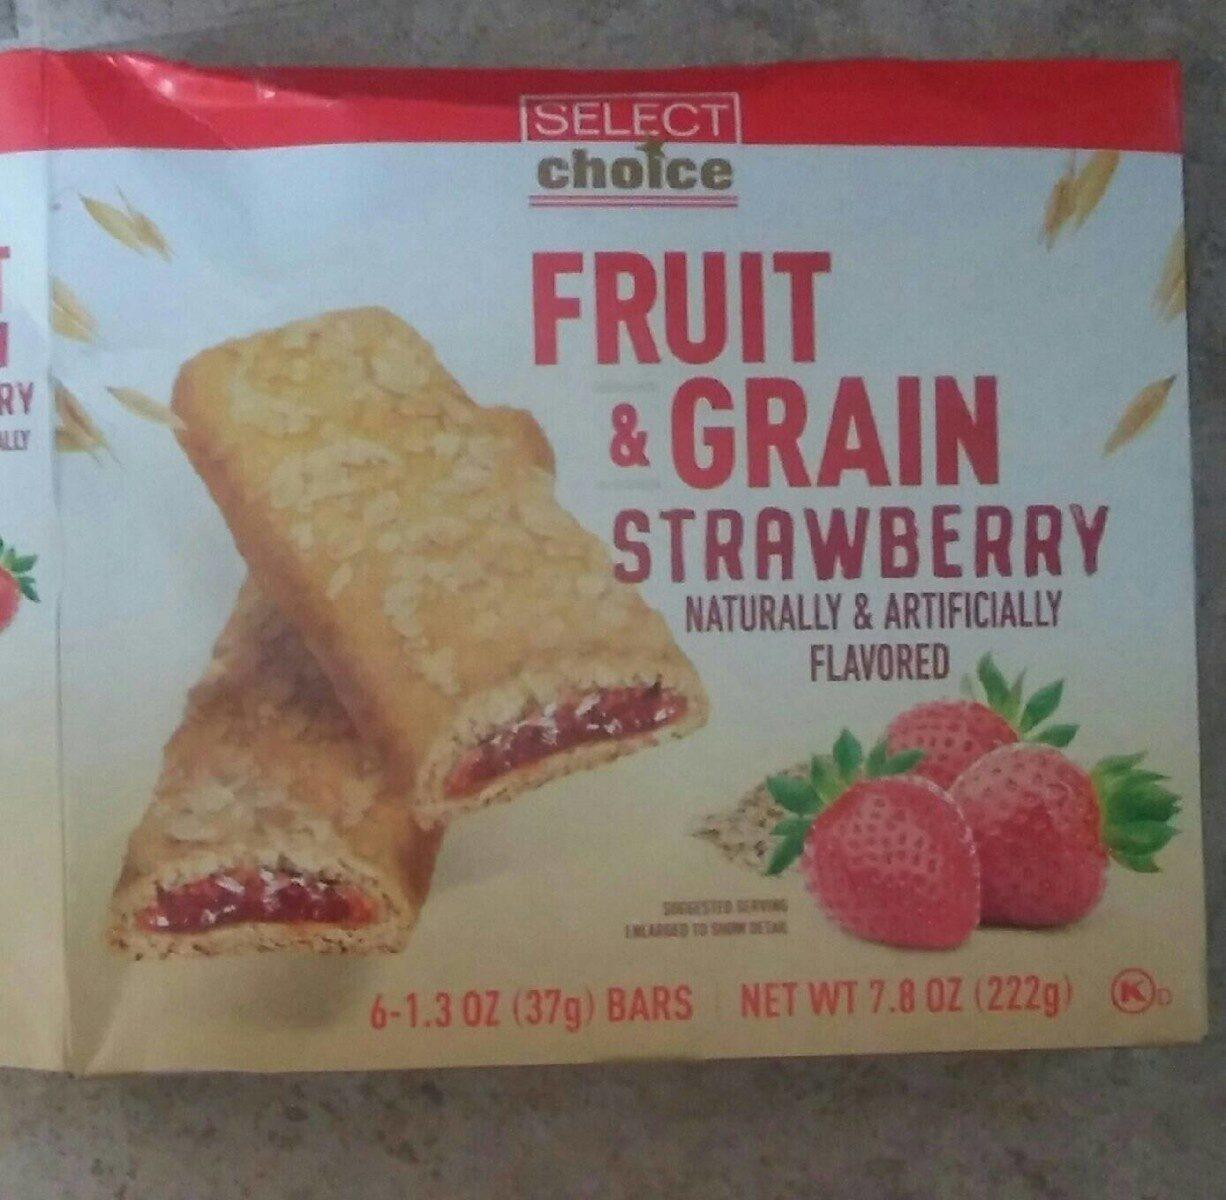 Fruit & Grain Strawberry - Product - fr